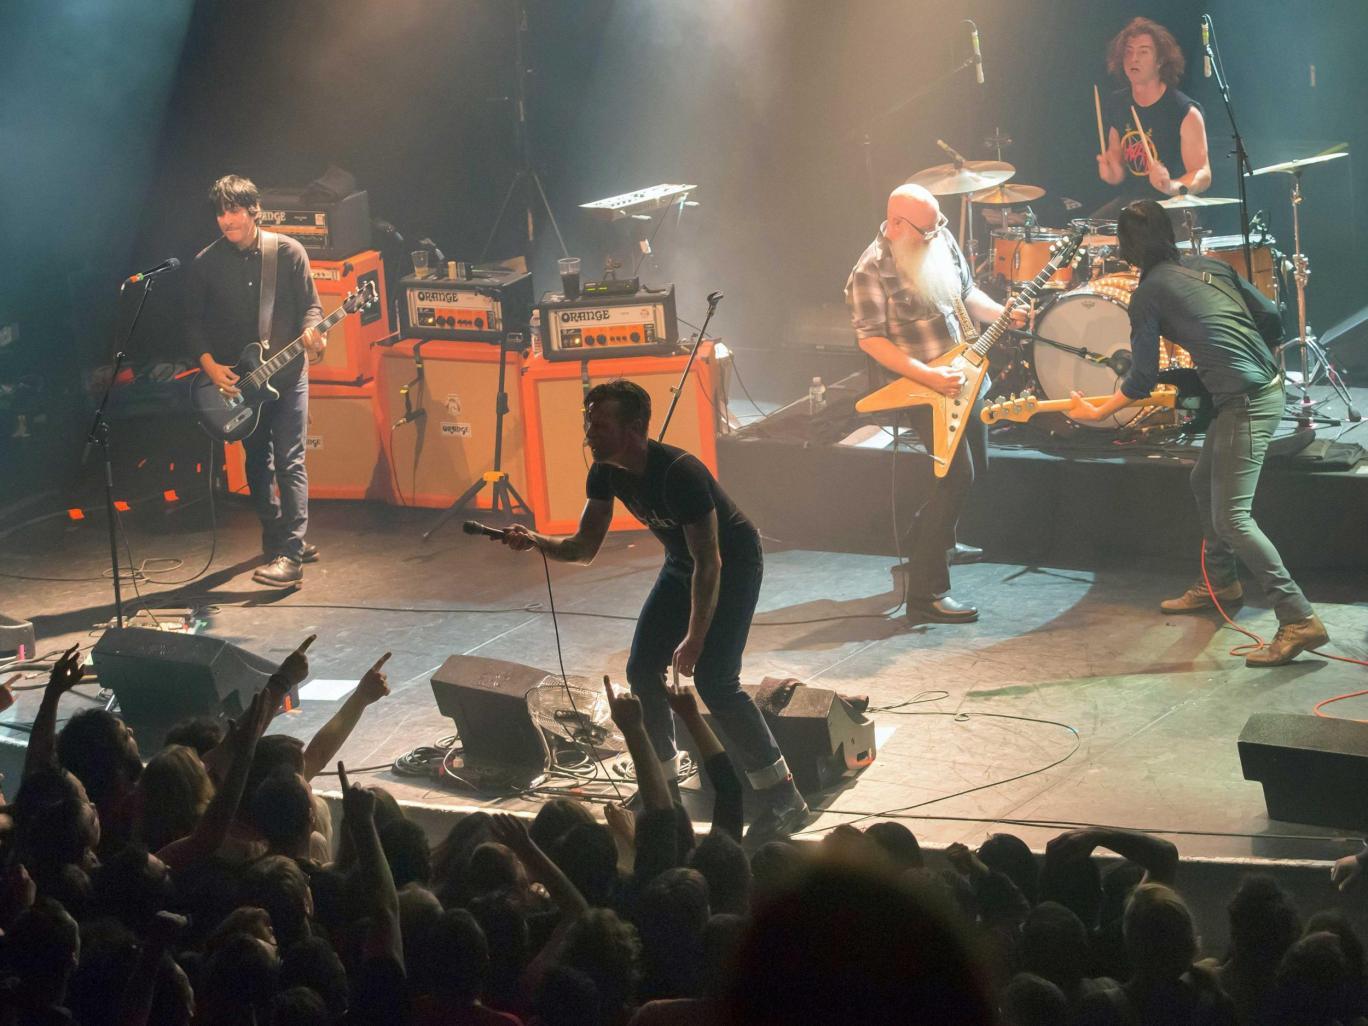 Eagles od Death Metal Ricordano Attimi Terribili al Bataclan